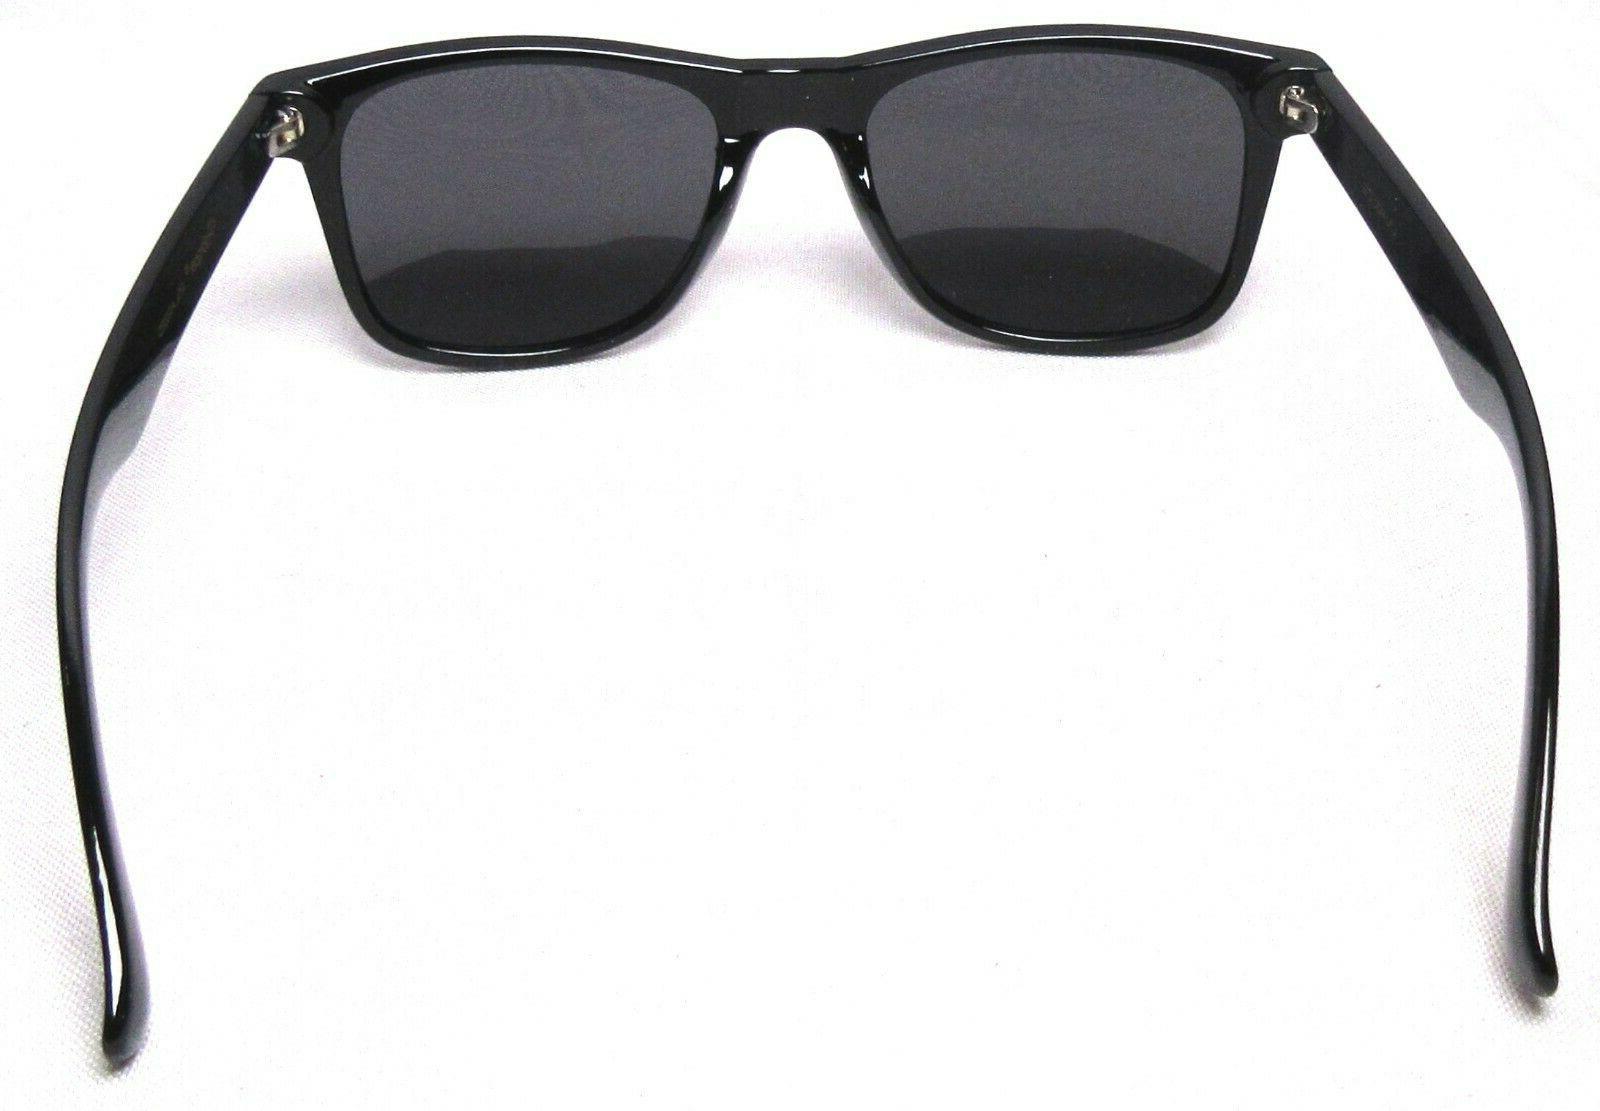 POLARSPEX Polarized 80's Sunglasses PSX01-BK-SMK